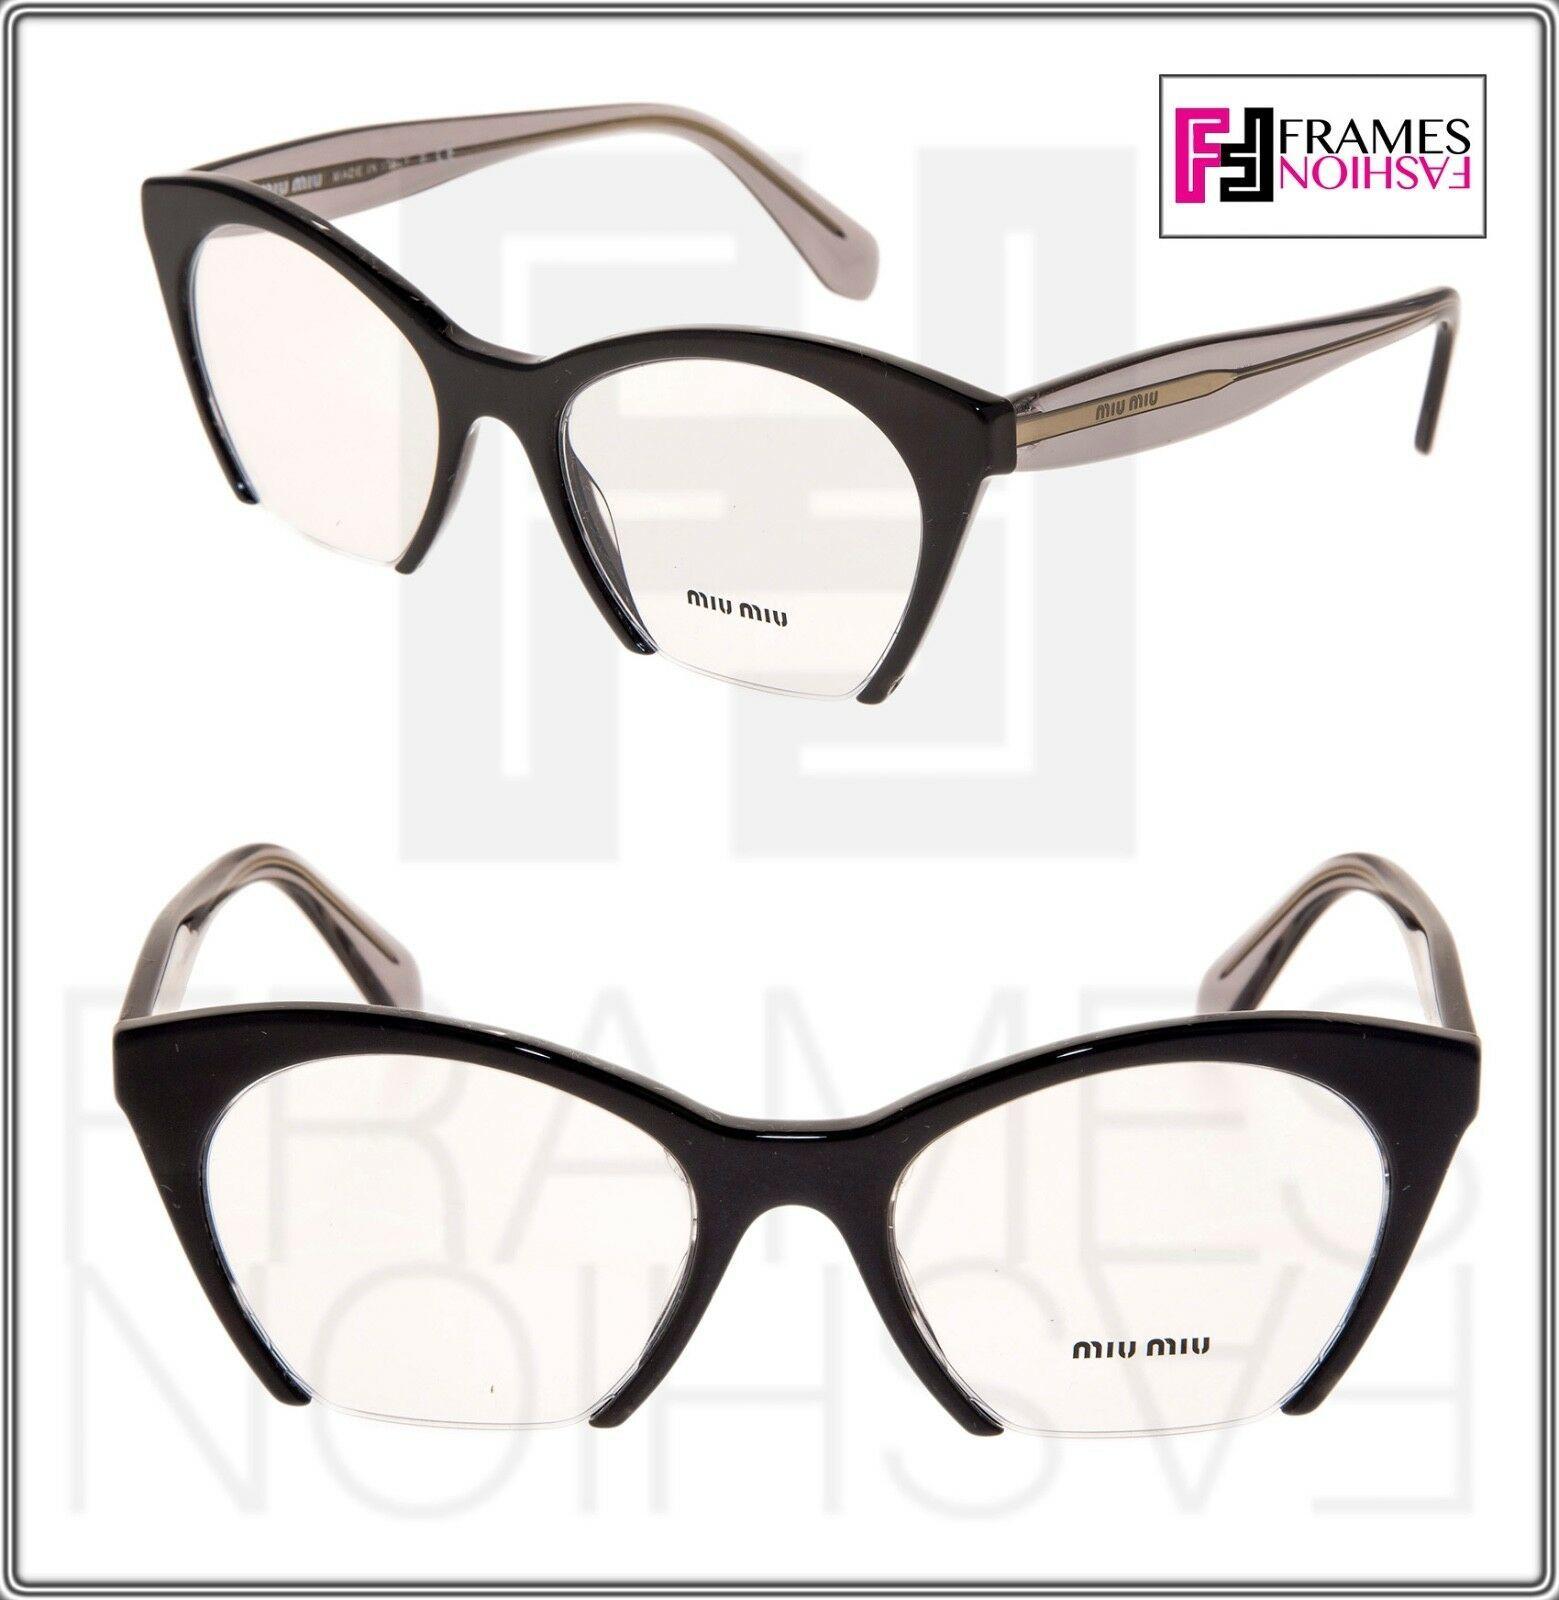 MIU MIU RASOIR MU03QV Eyeglasses Optical Frame Black Grey Translucent 51mm 03Q